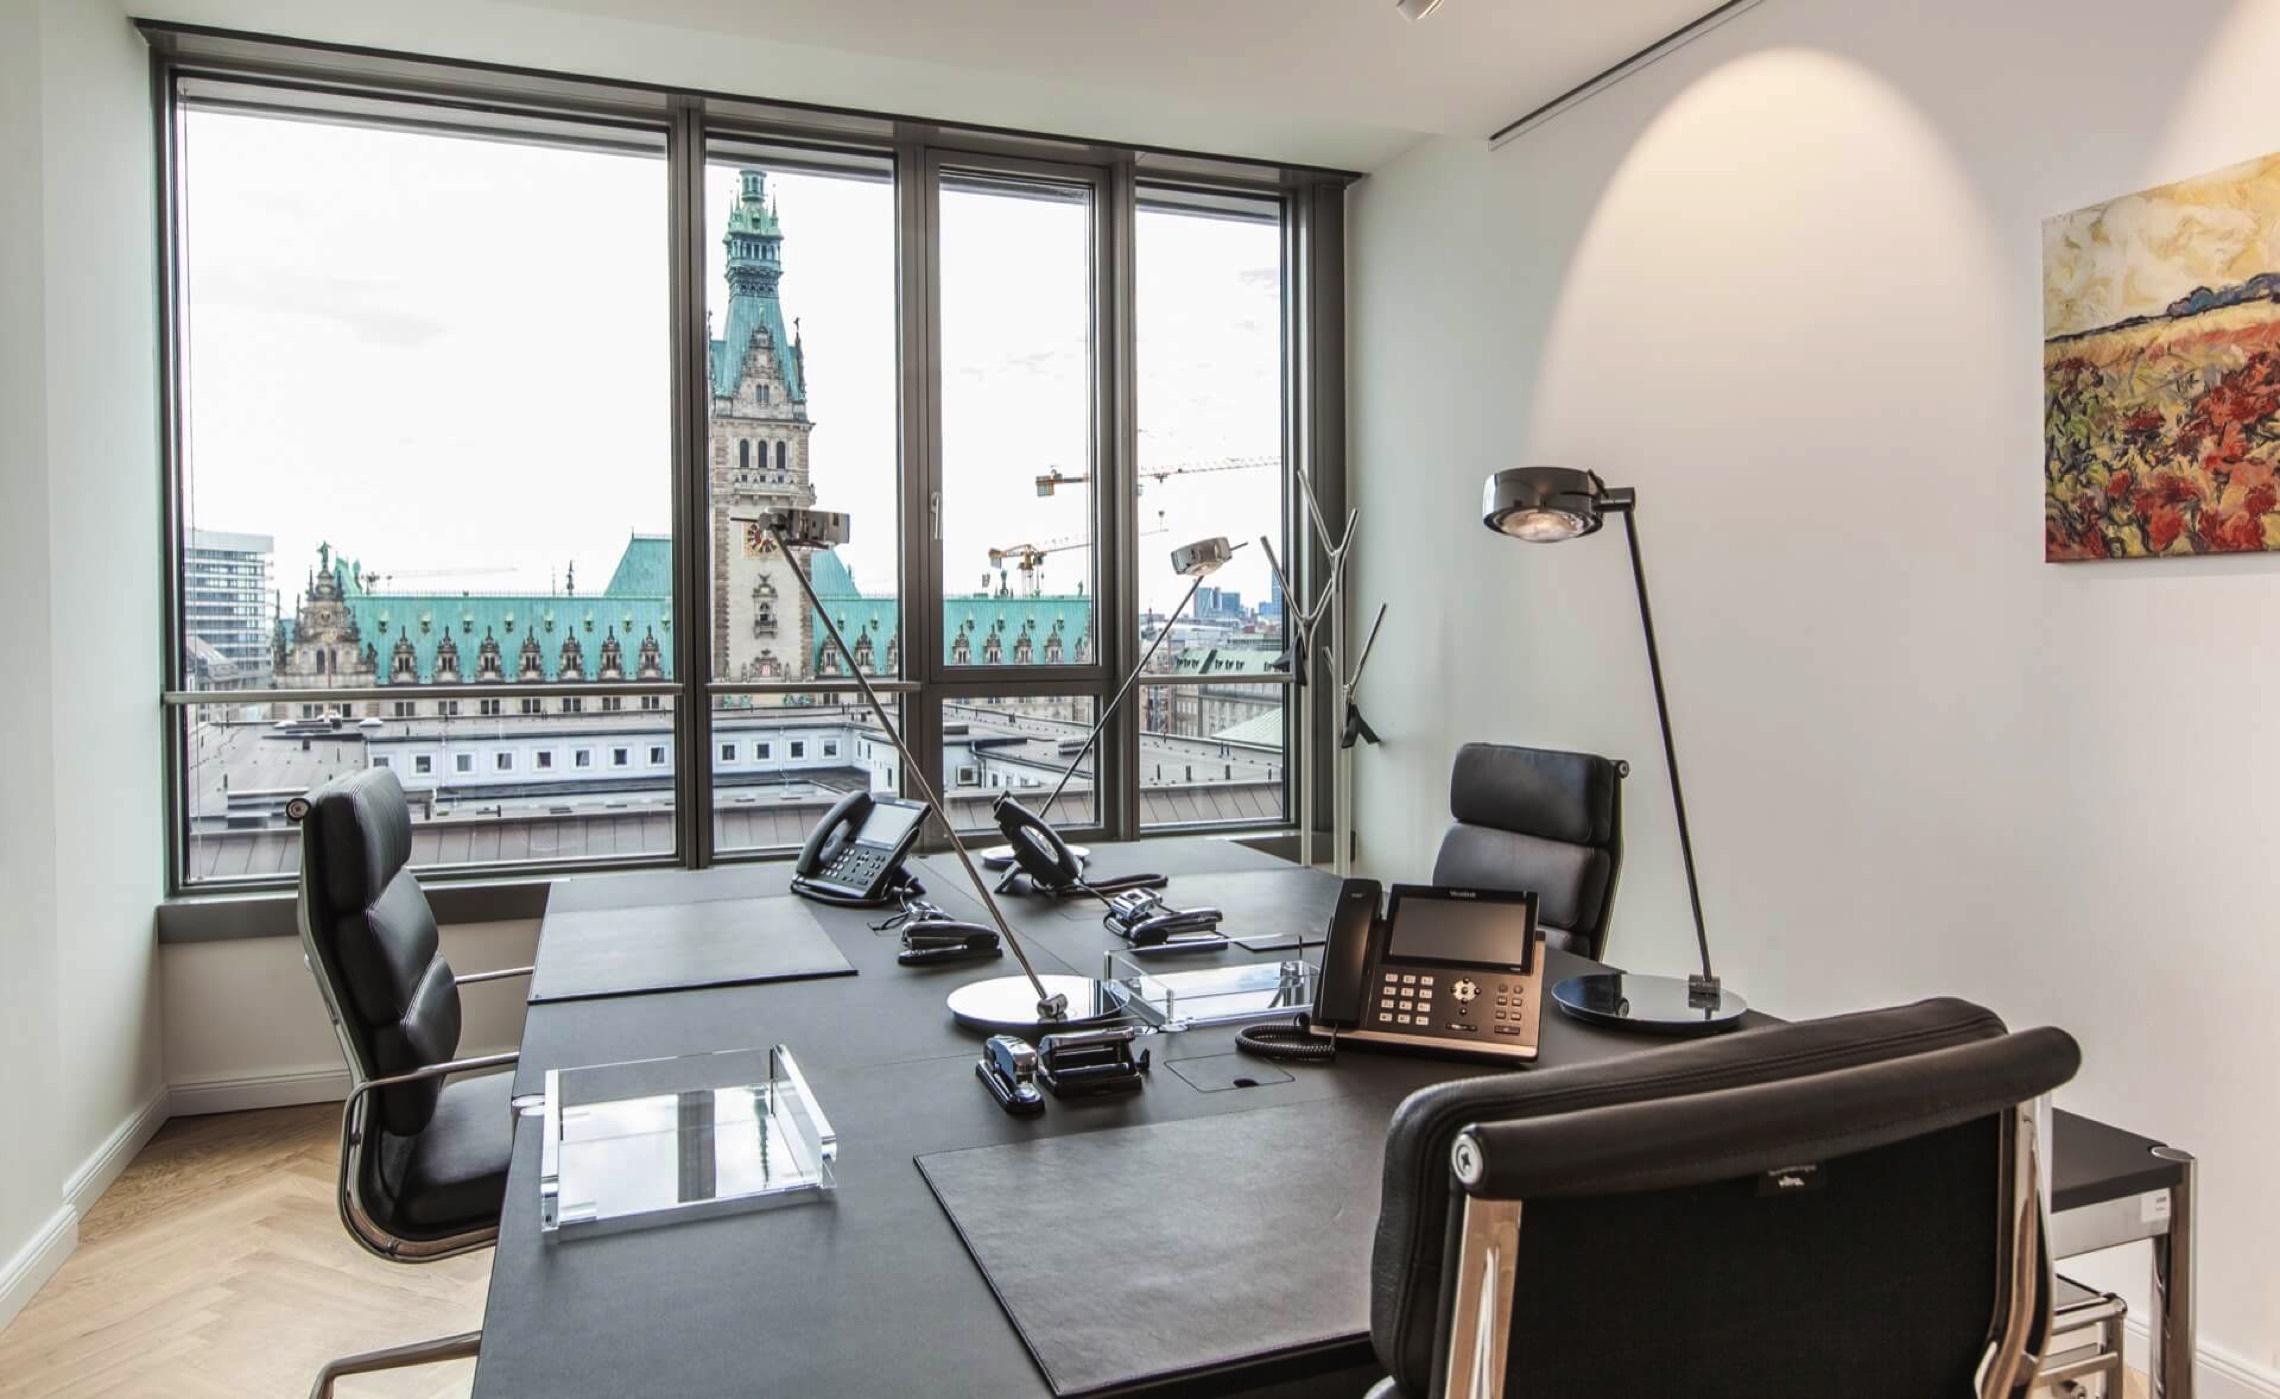 Europakontor Hamburg Rathaus Buro 1 Office Inspiration